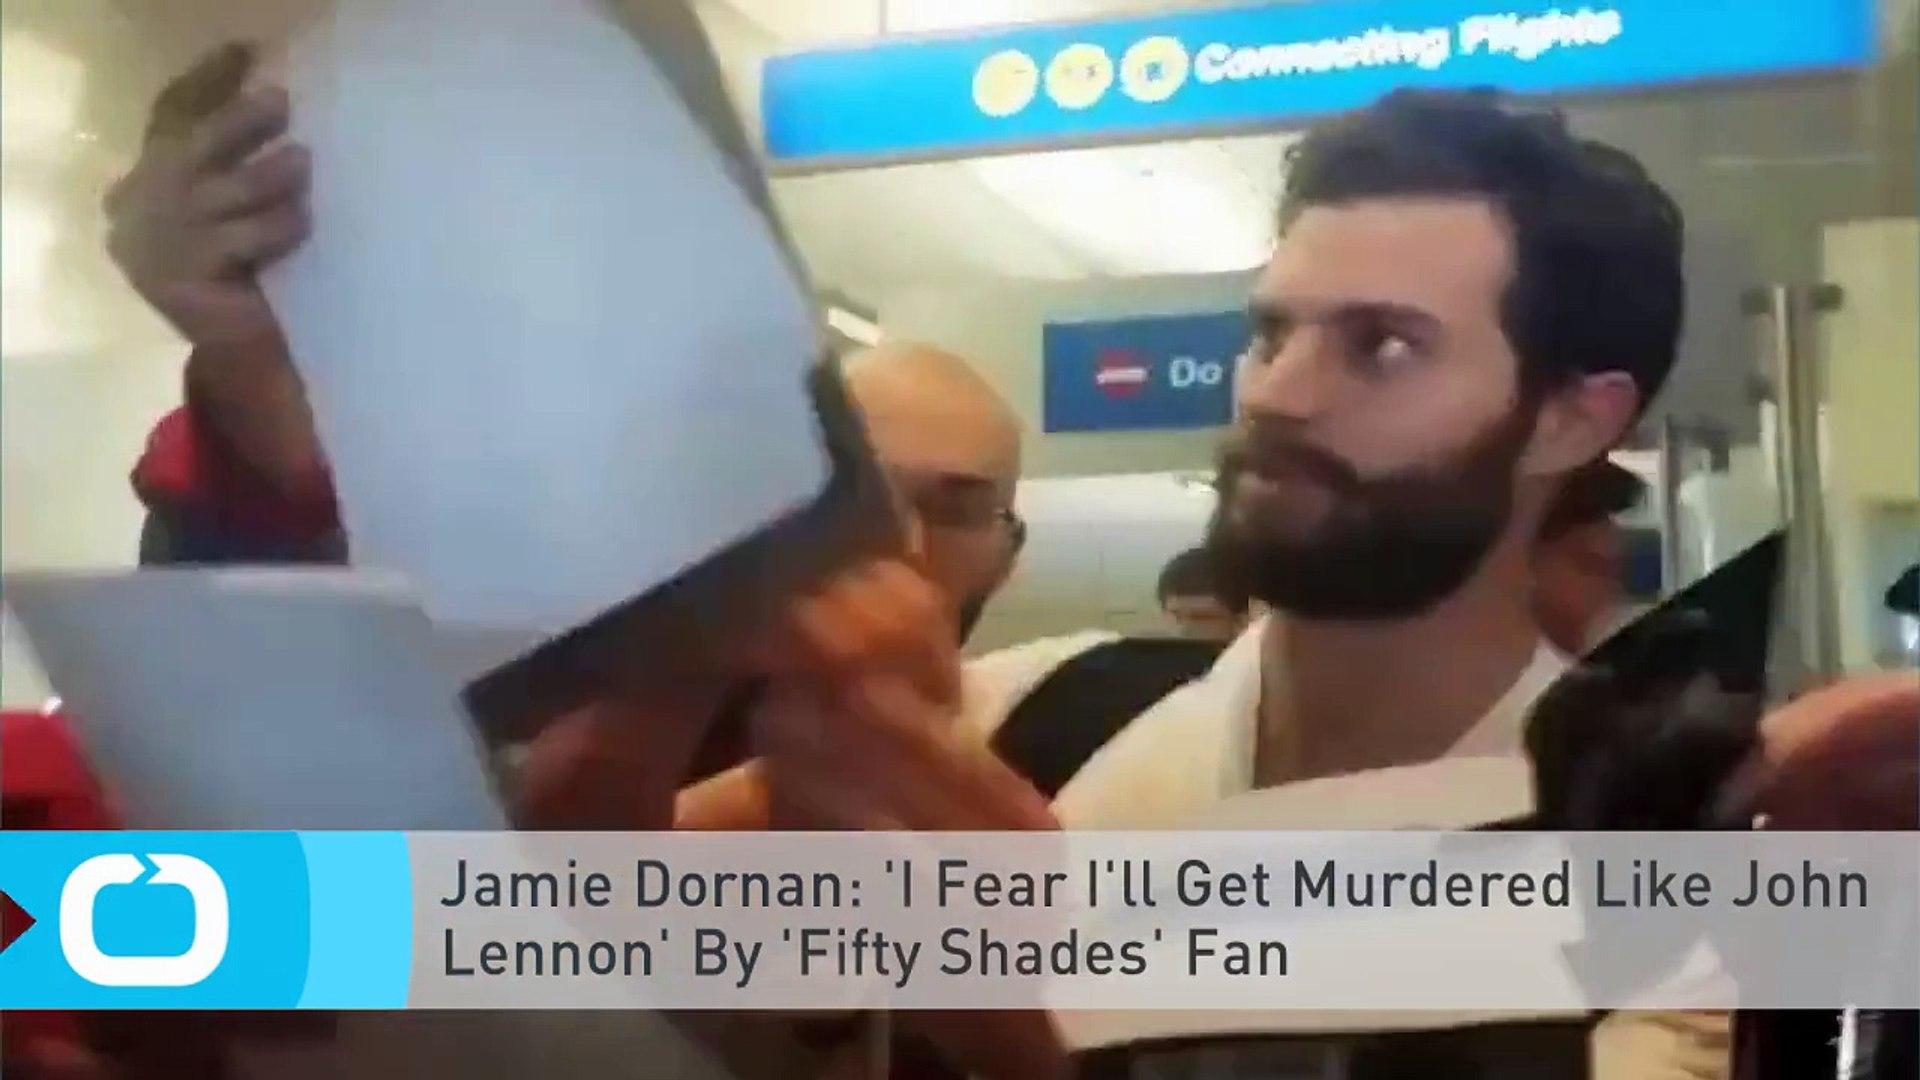 Jamie Dornan: 'I Fear I'll Get Murdered Like John Lennon' By 'Fifty Shades'